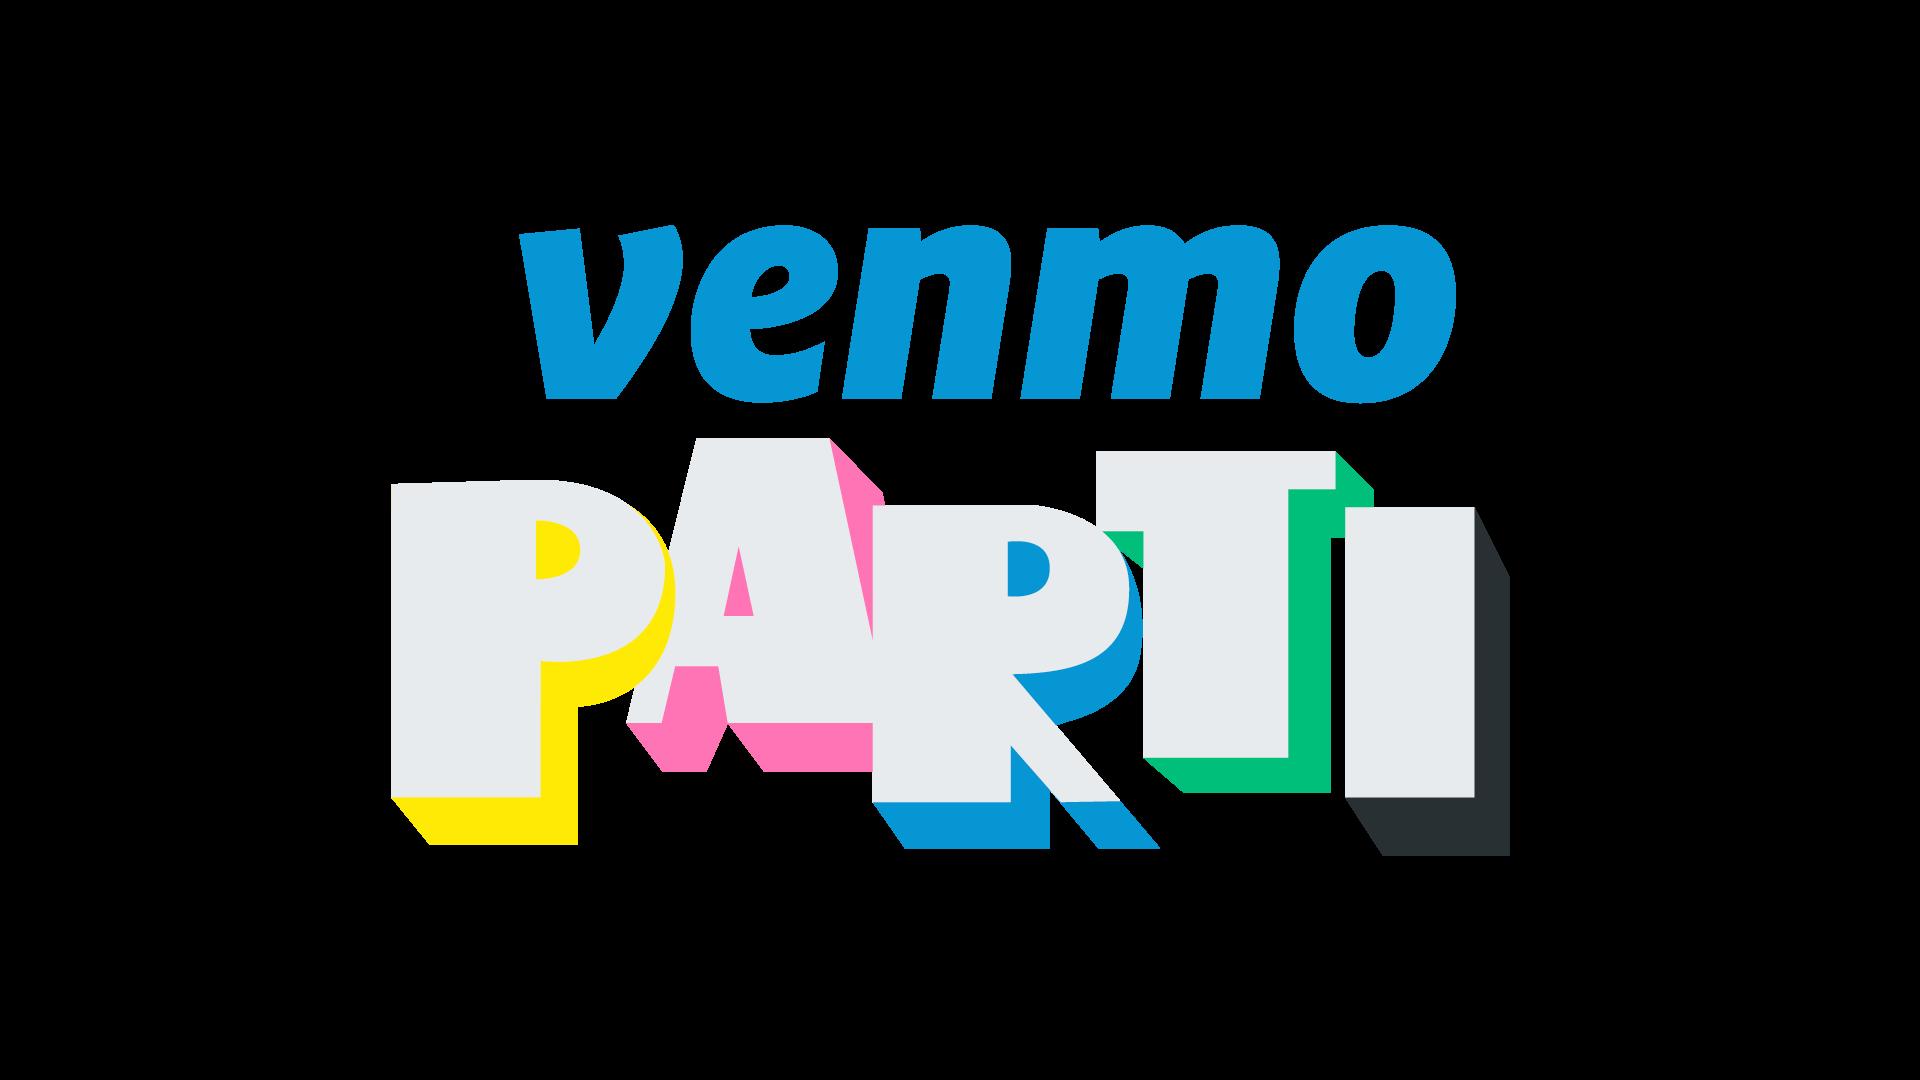 venmo-logo_updated-2